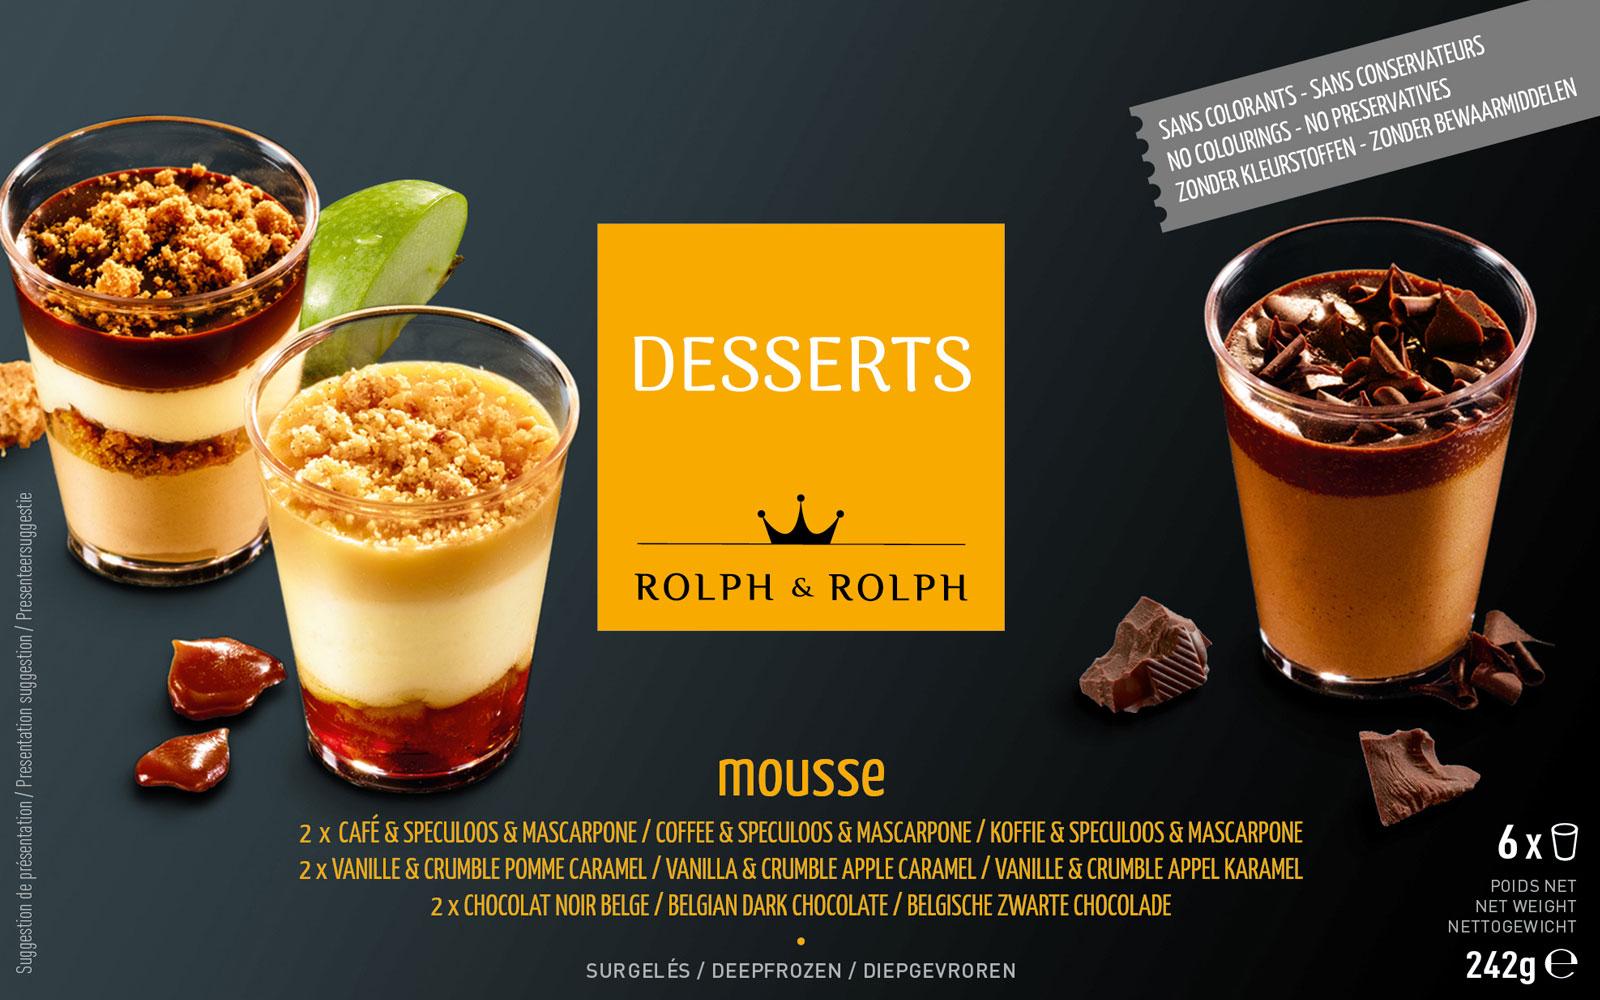 rolph&rolph mousse dessert